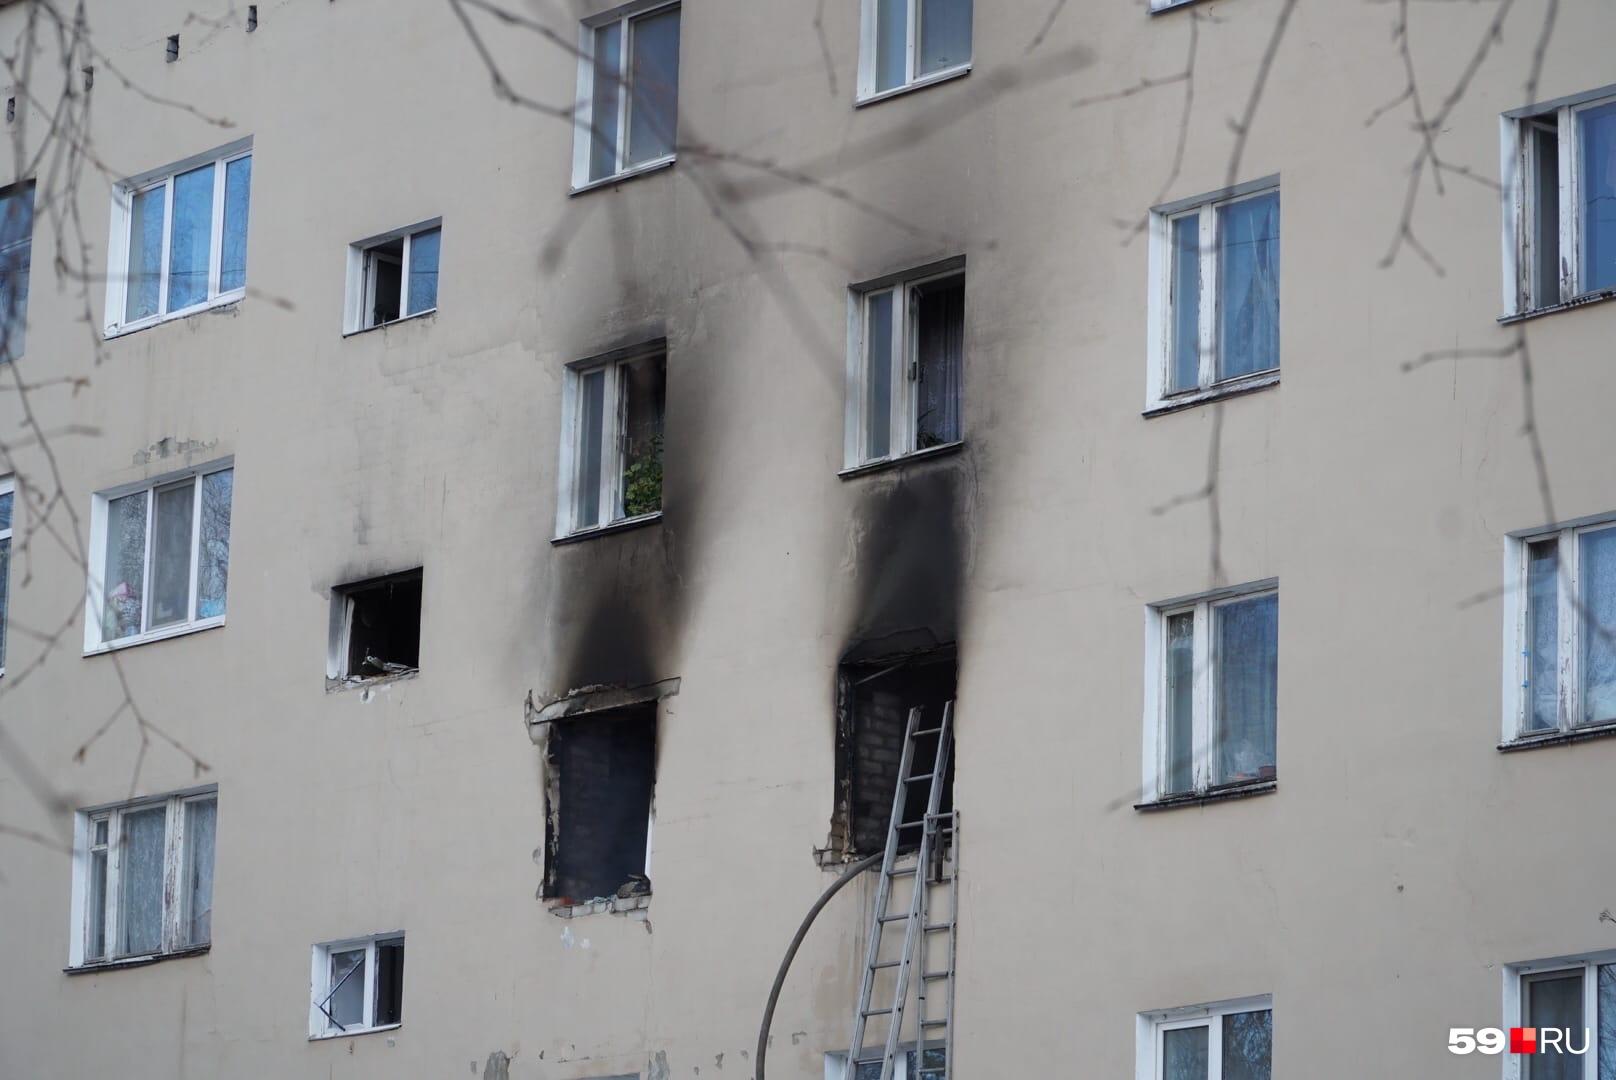 Фасад здания закопчен, но дым уже почти не валит